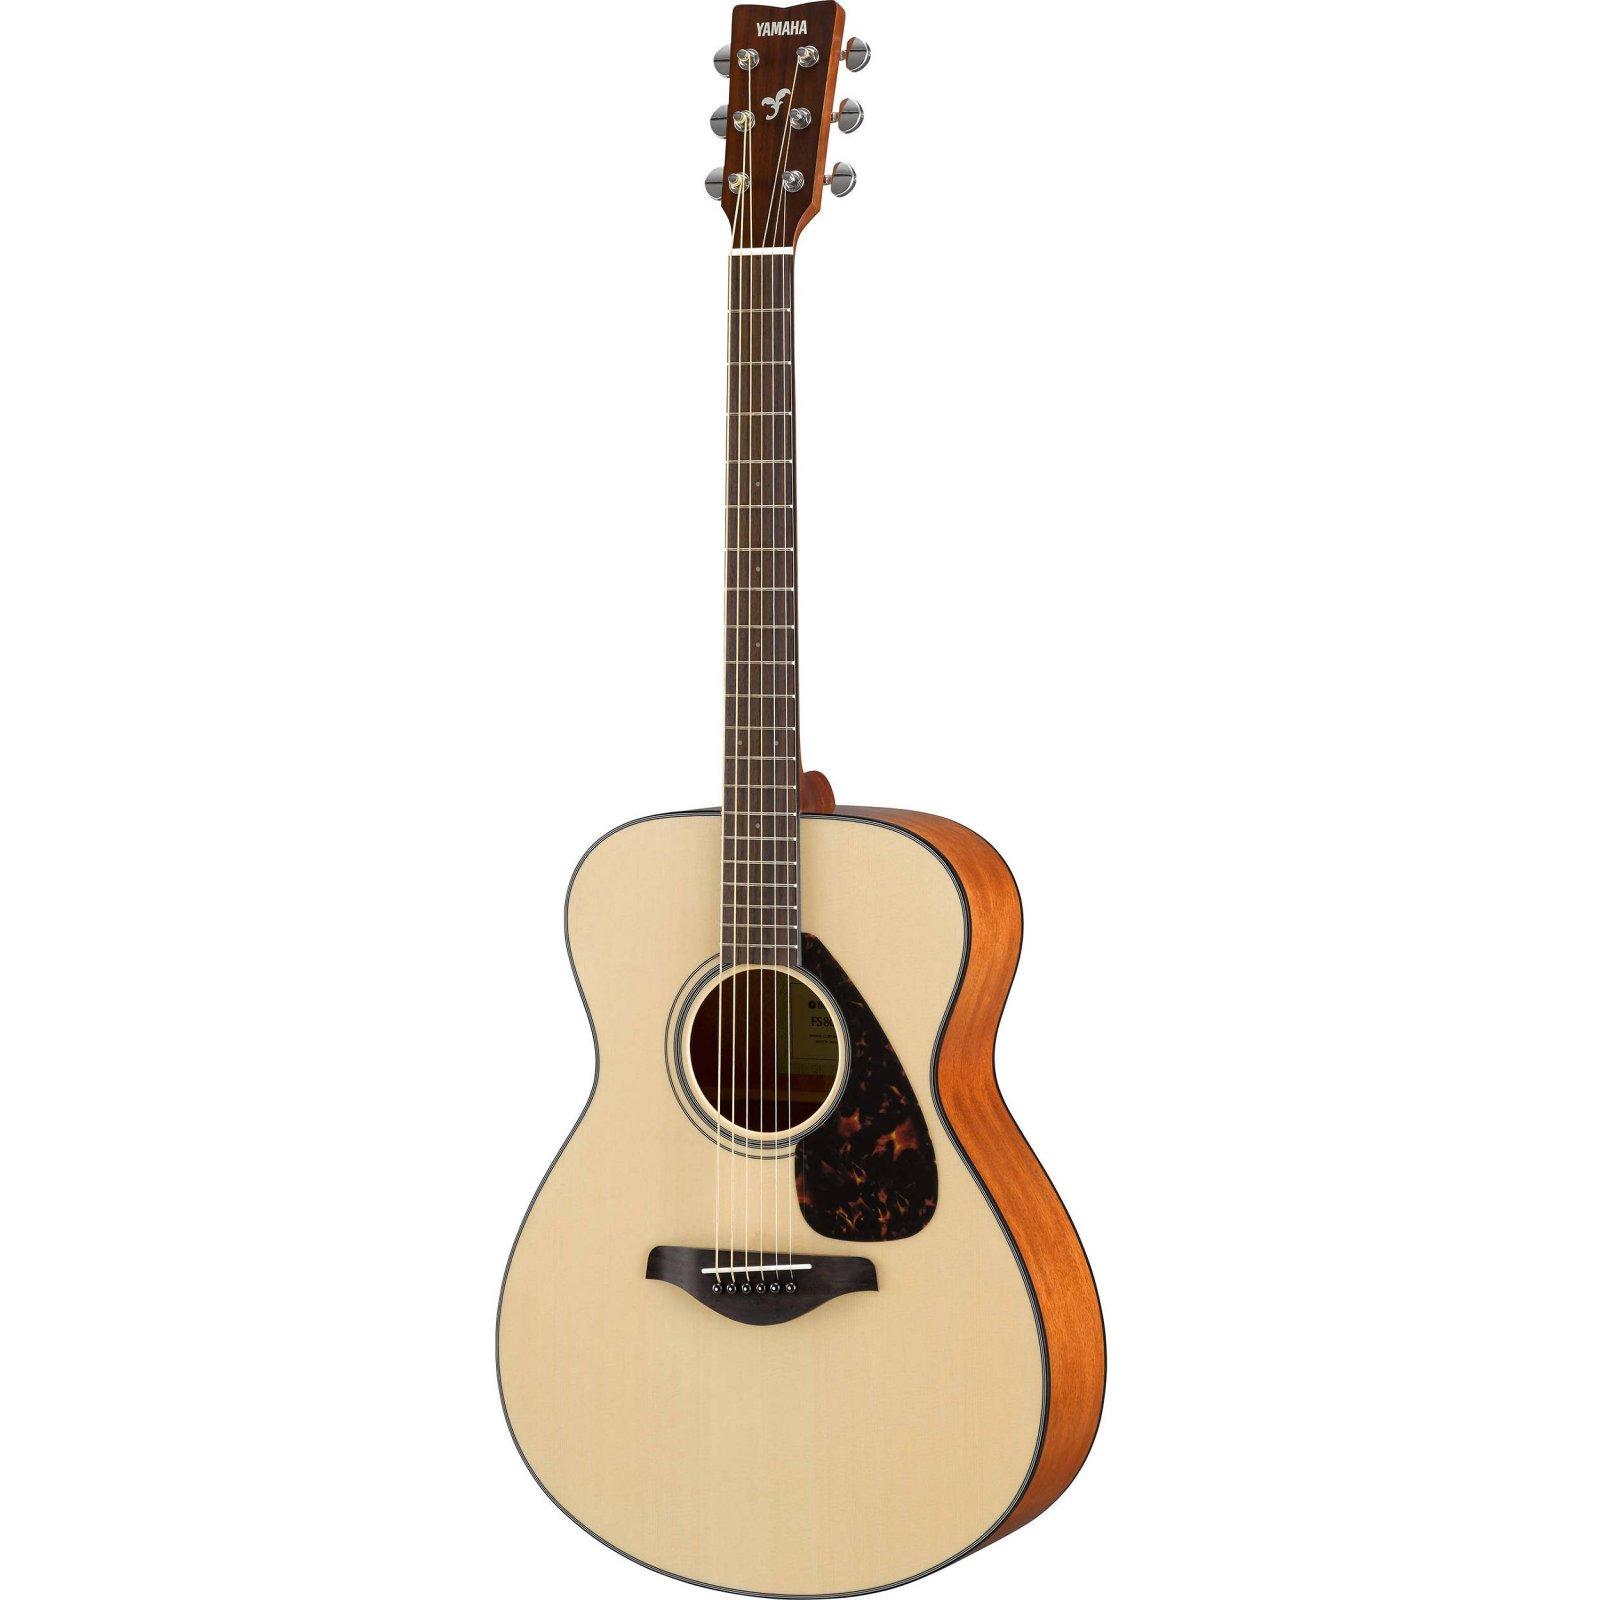 Yamaha FS800 Small Body Folk Guitar - Solid Top Spruce, Mahogany Sides, Nato Back -Natural